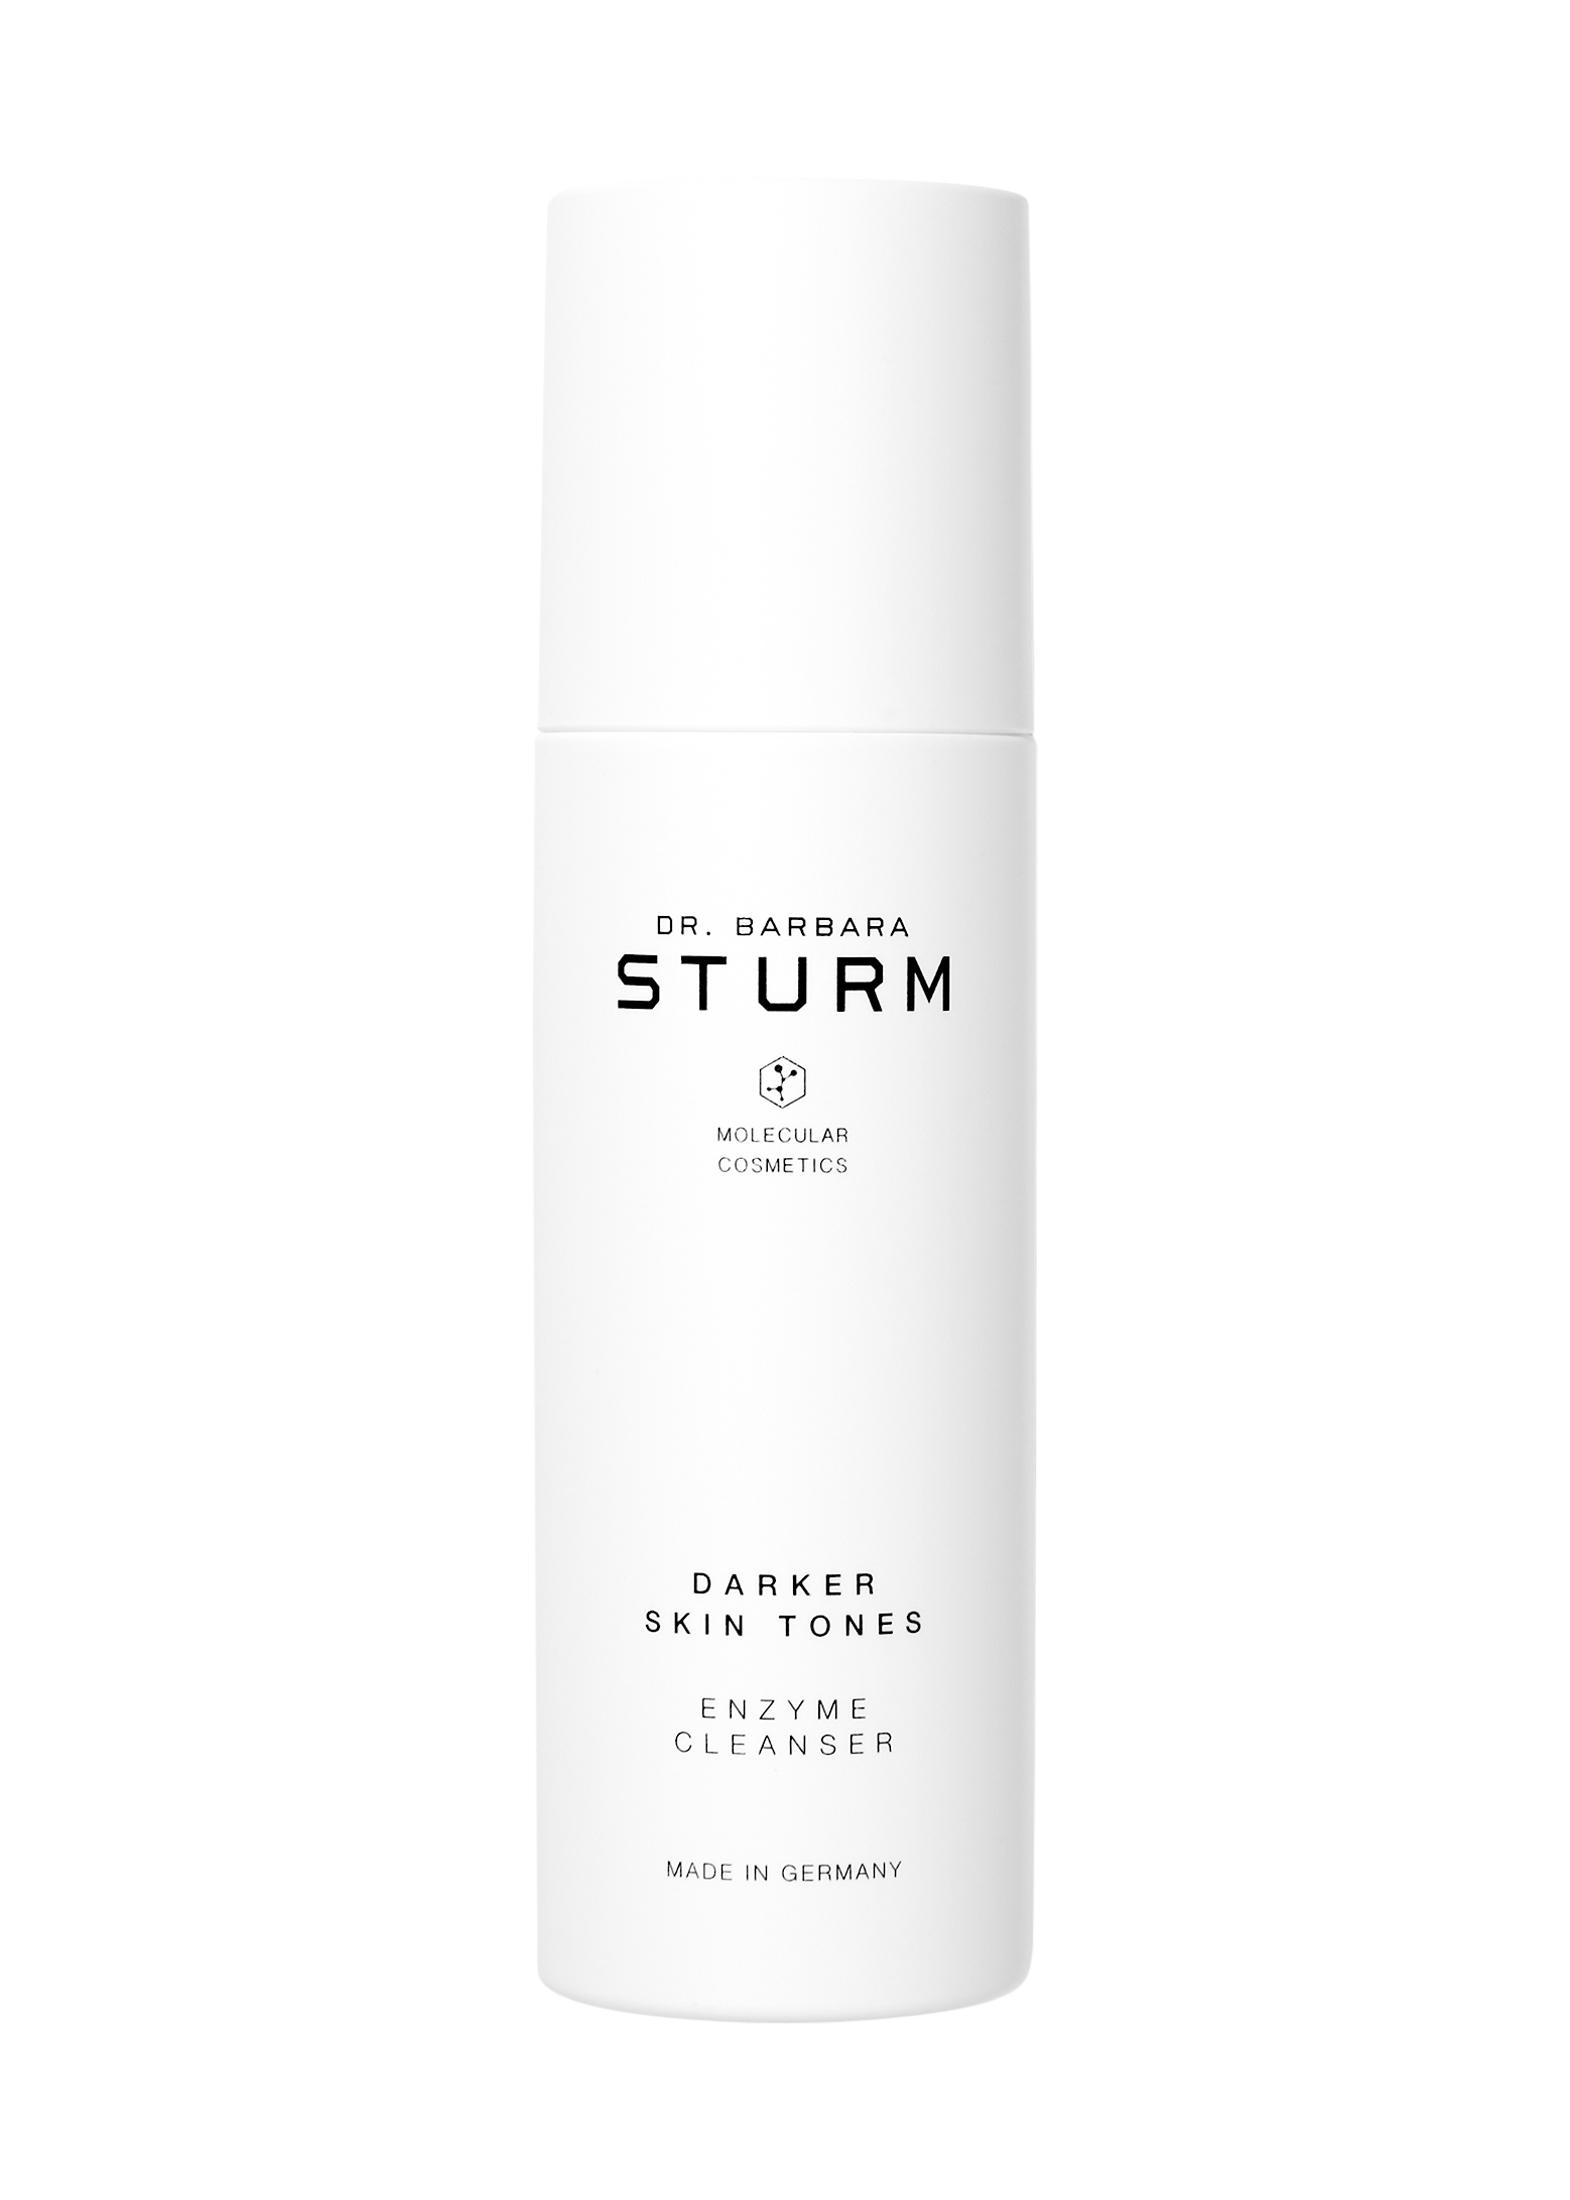 Darker Skin Tones Enzyme Cleanser 75ml image number 0